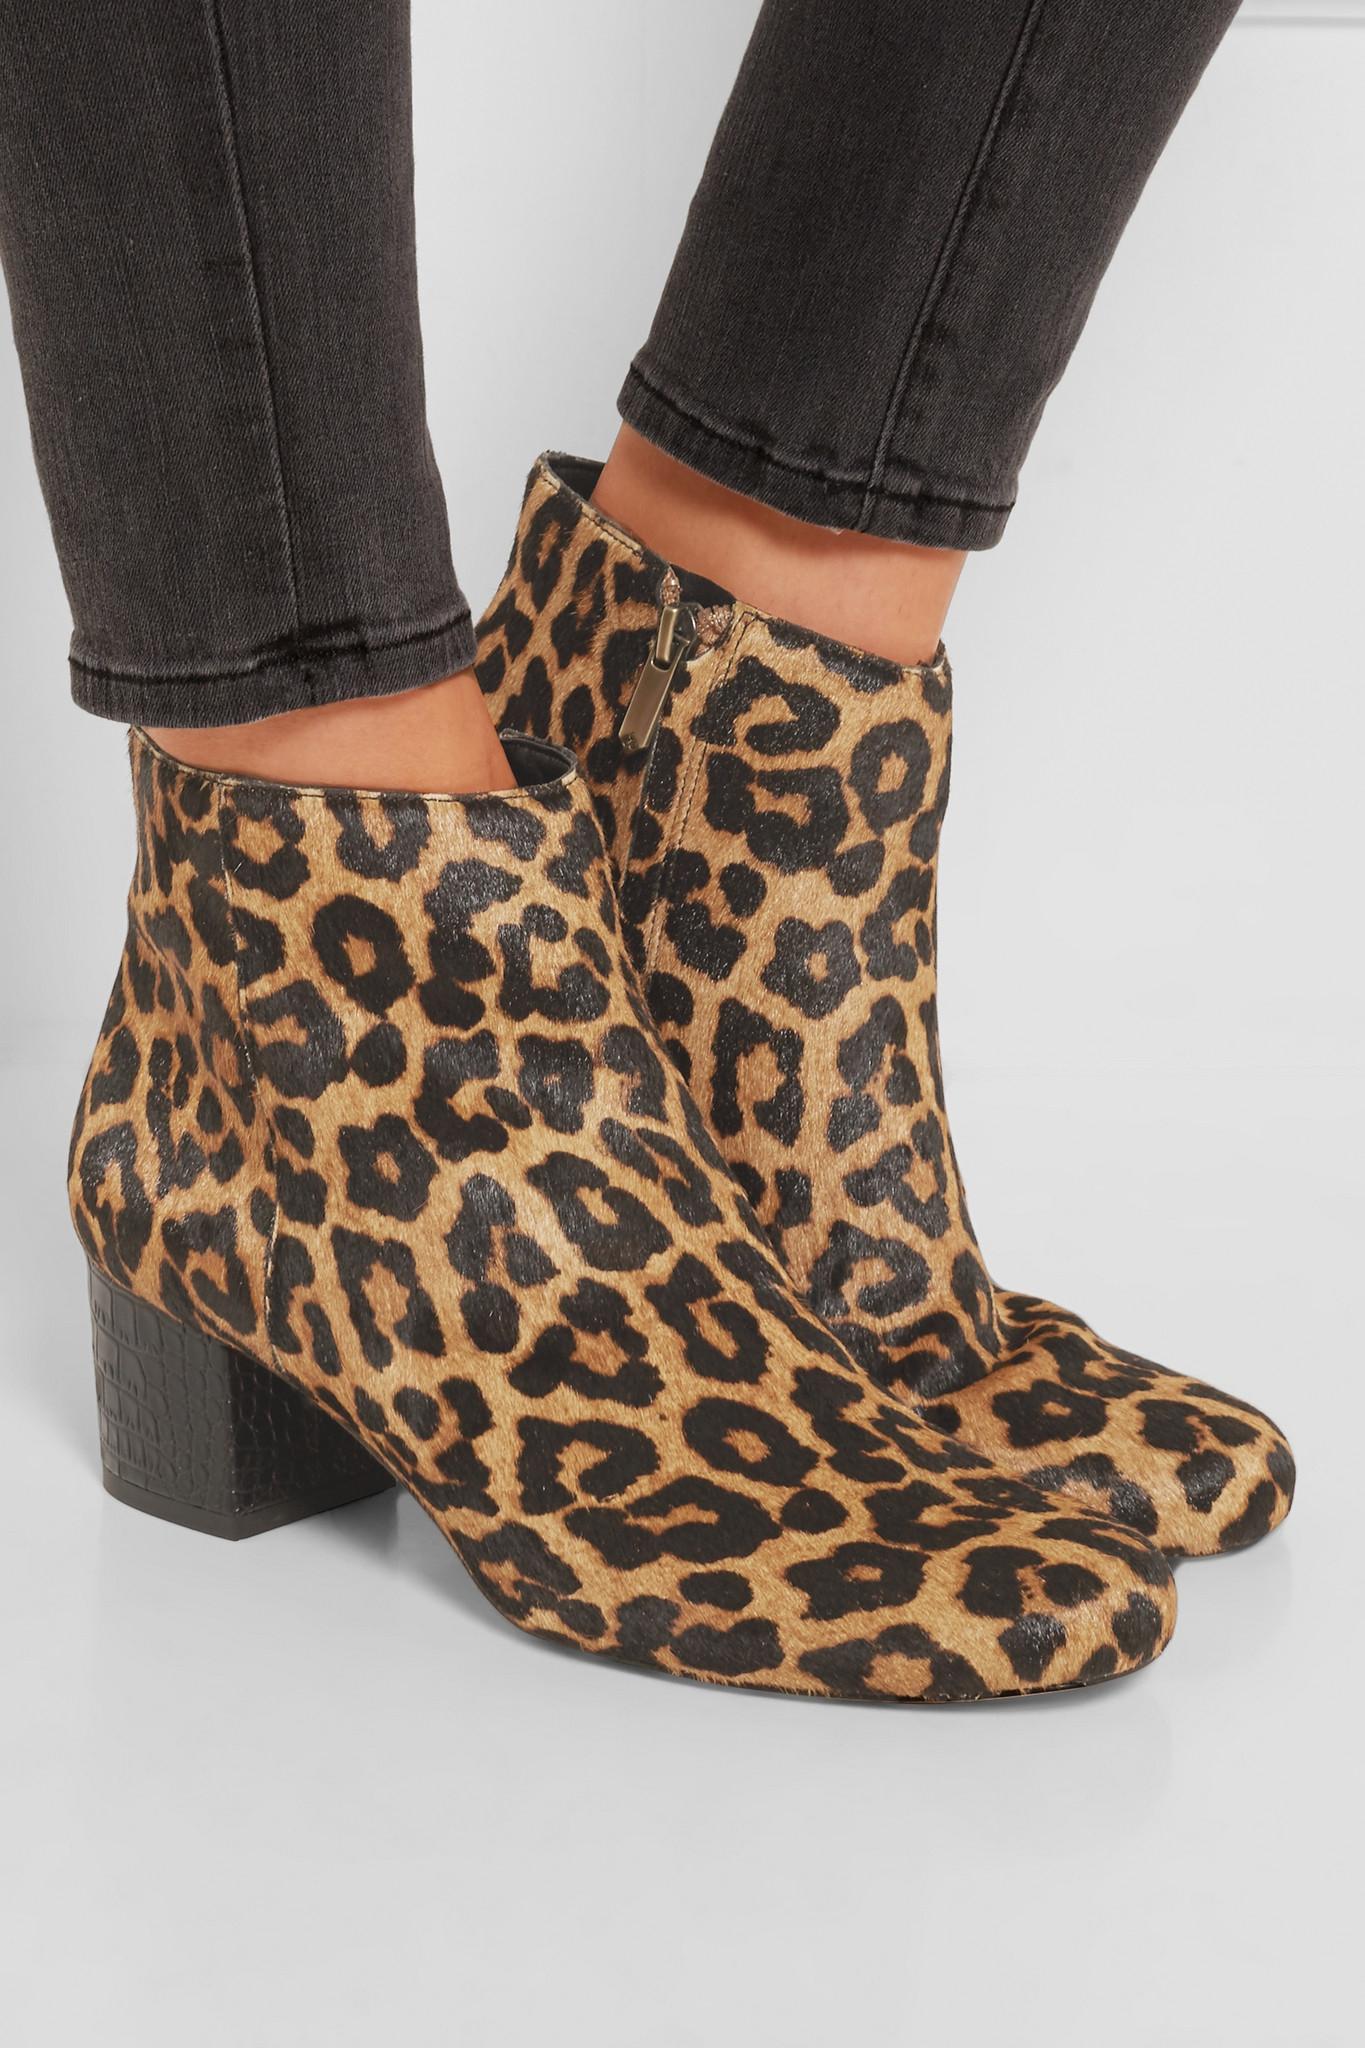 31c6f338398439 Lyst - Sam Edelman Edith Leopard-print Calf Hair Ankle Boots in Brown